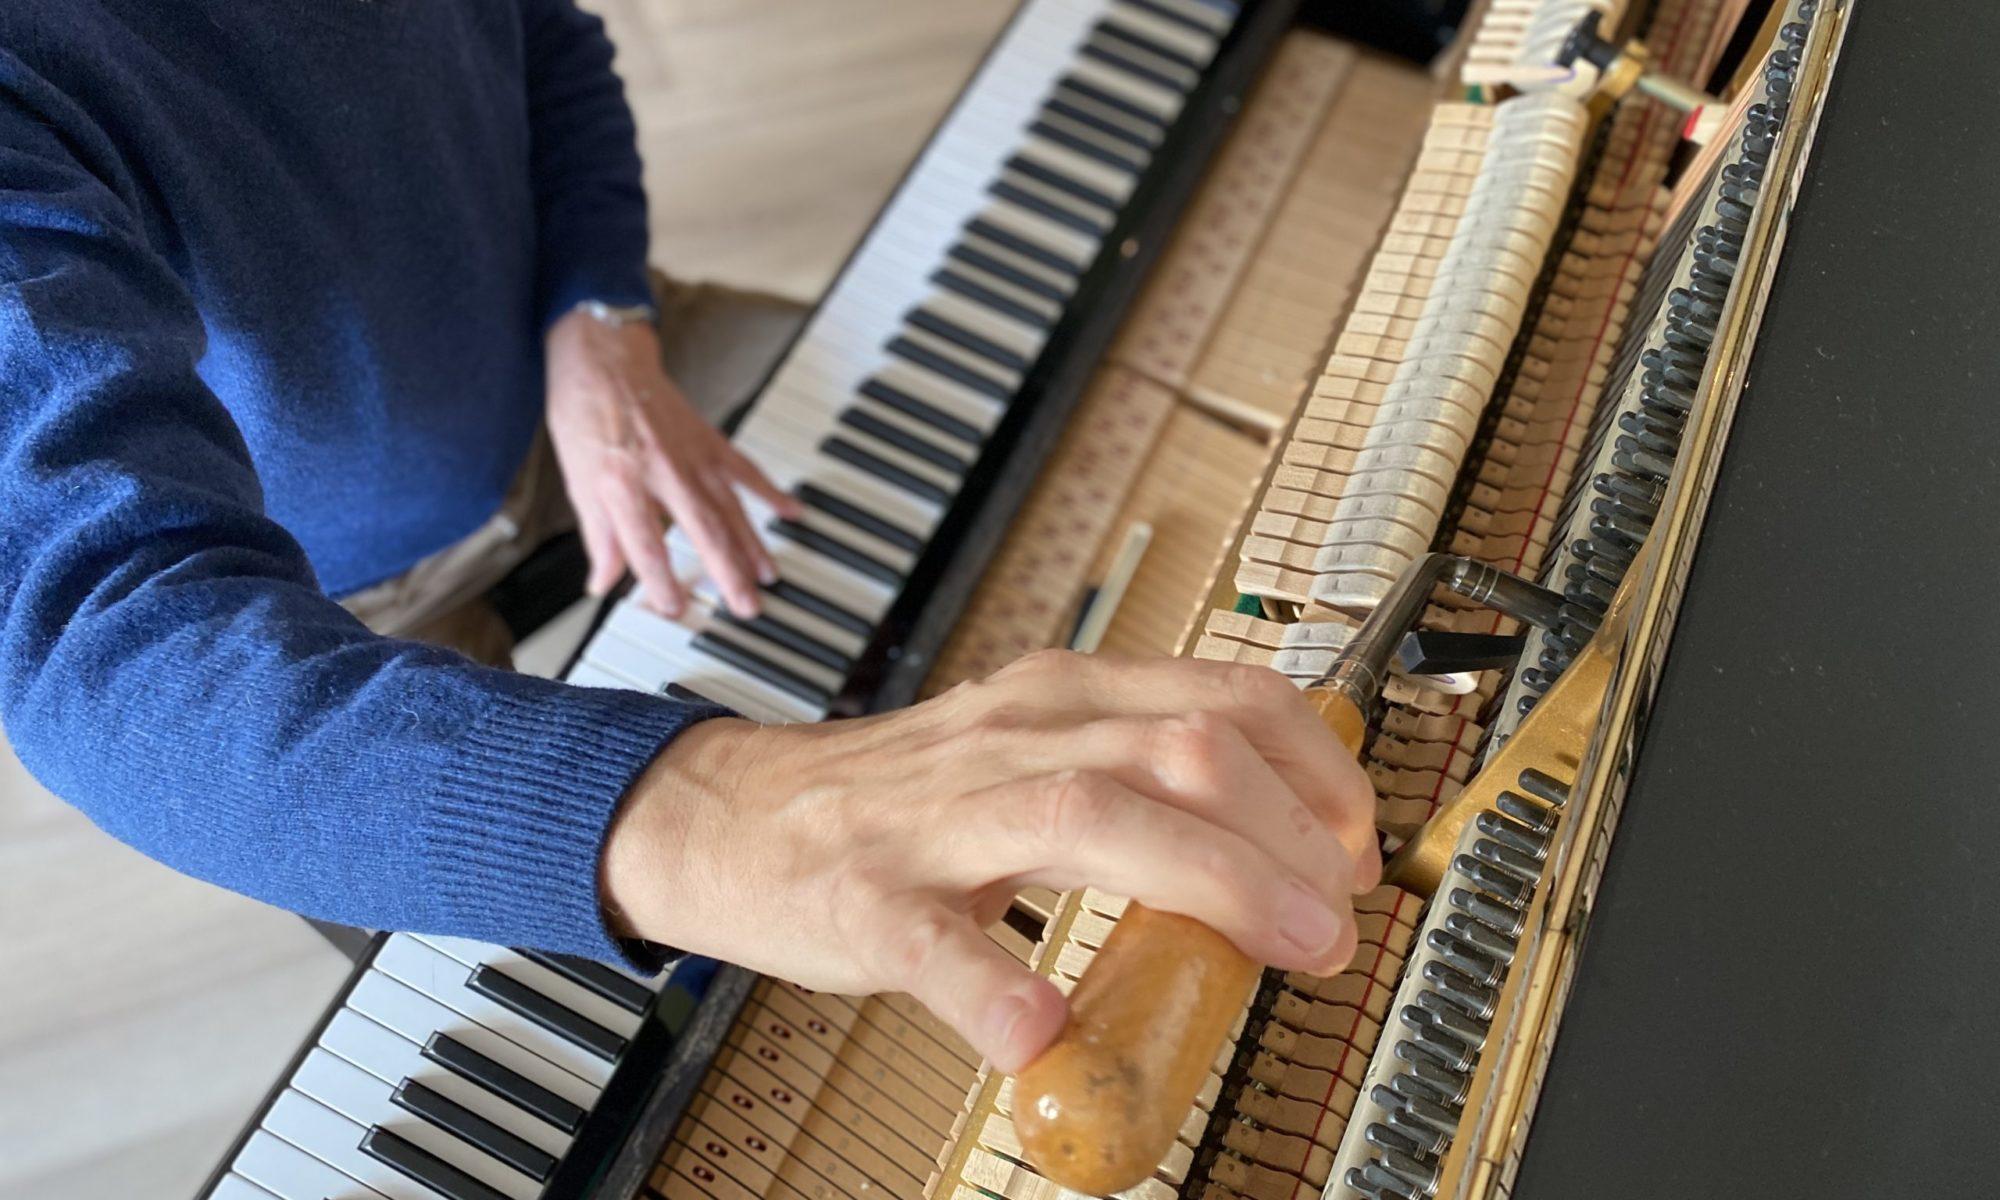 Pianostemmer Cees Gootjes